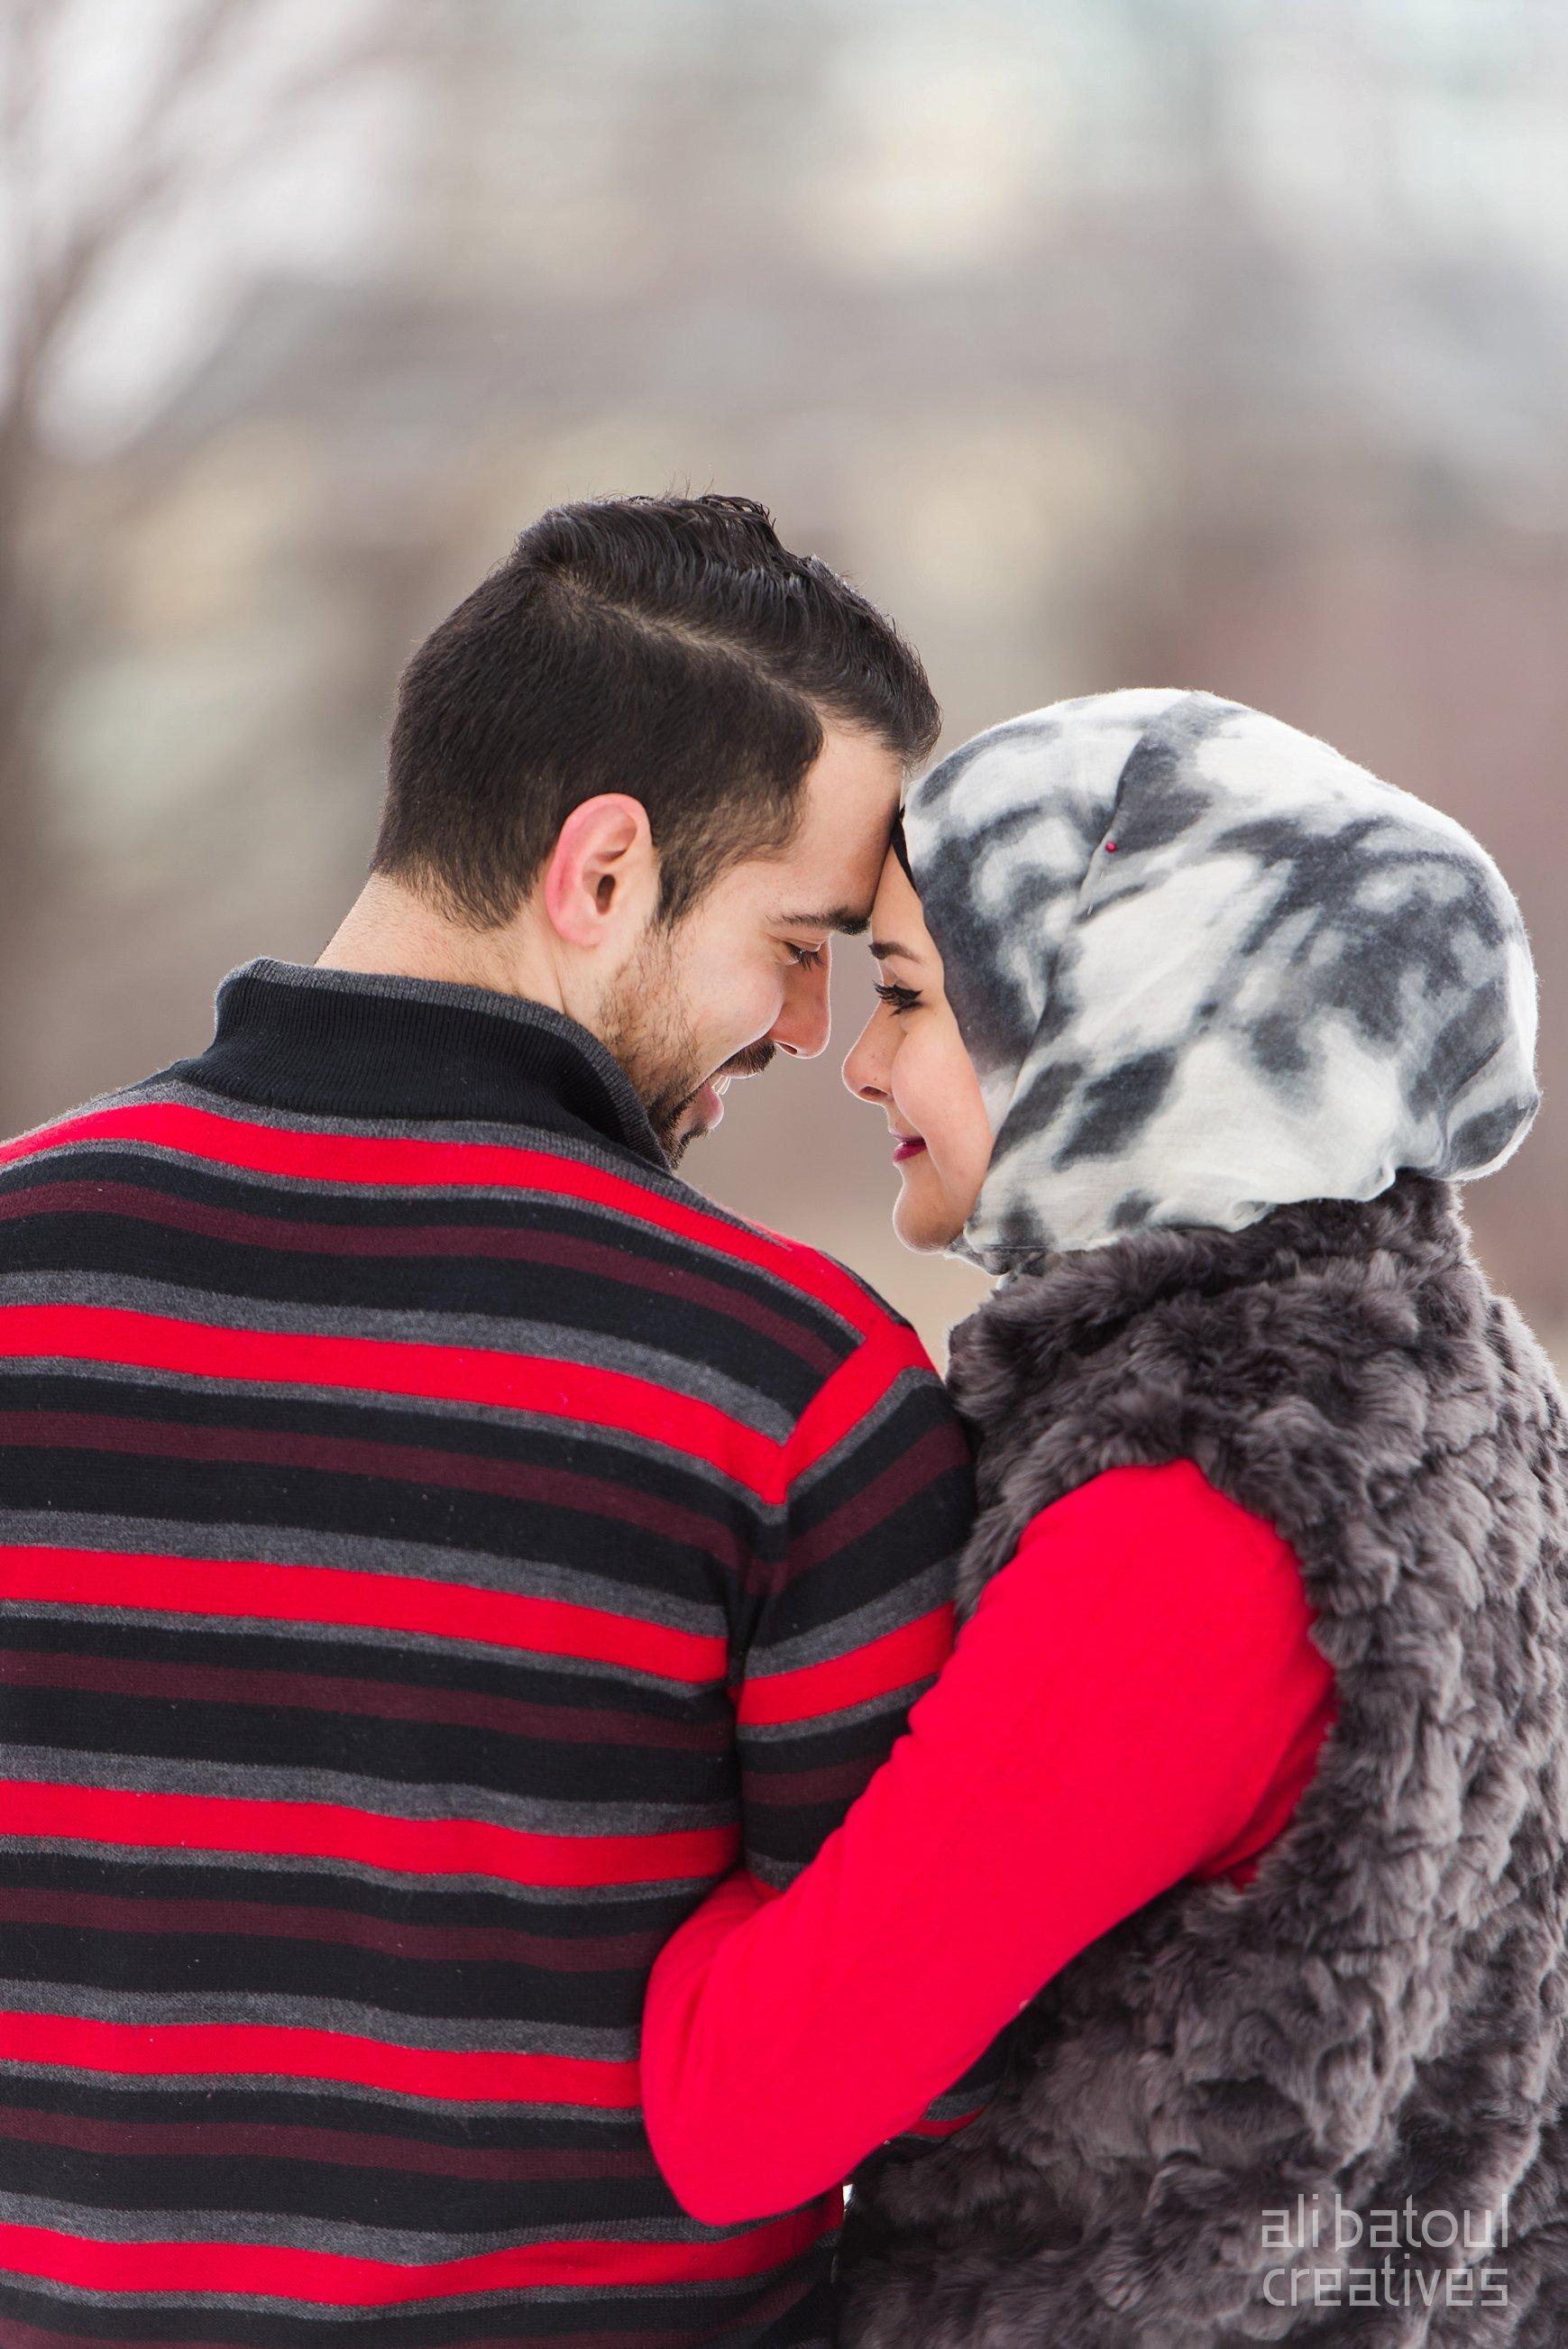 Hanan + Said Engagement - Ali Batoul Creatives Photography_0014.jpg